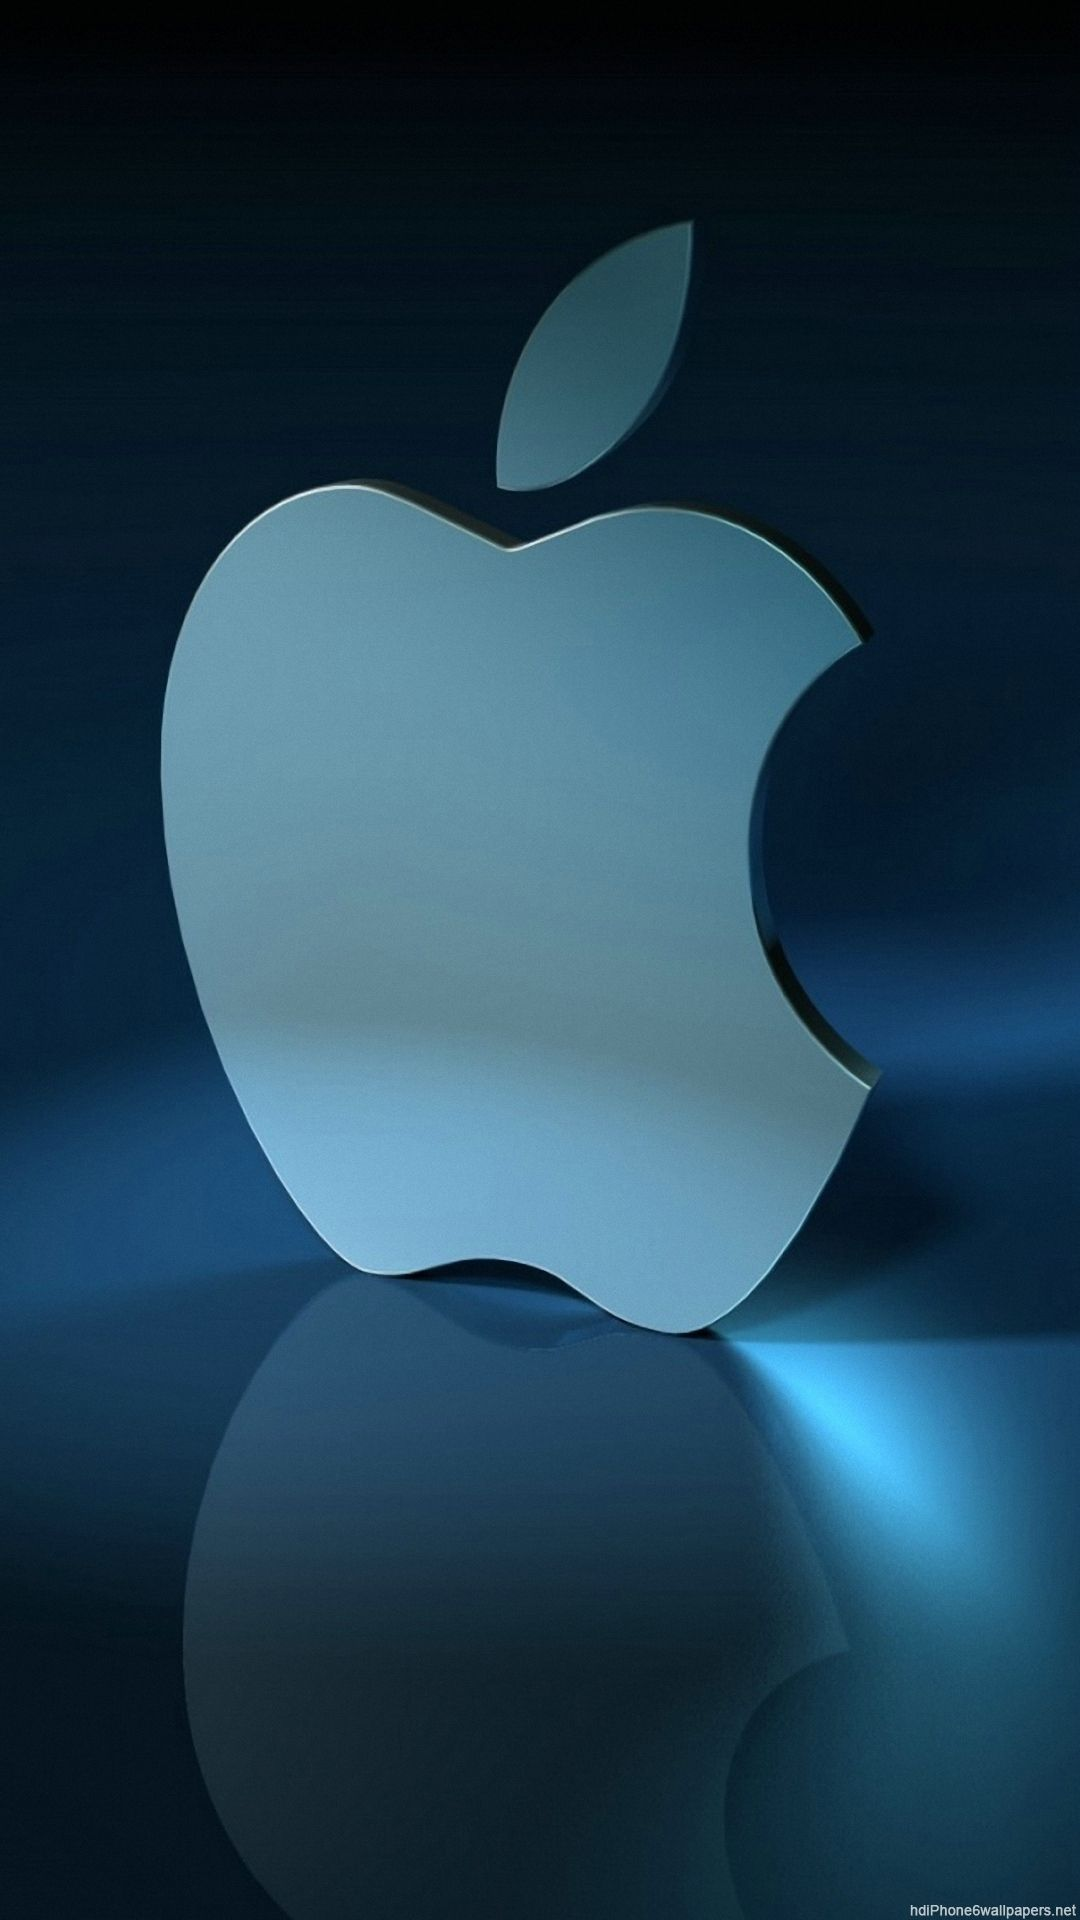 Black Glossy Apple Logo Iphone Wallpaper Hd Iphone 5 Wallpapers Apple Iphone Wallpaper Hd Apple Iphone 5s Wallpaper Iphone 5s Wallpaper